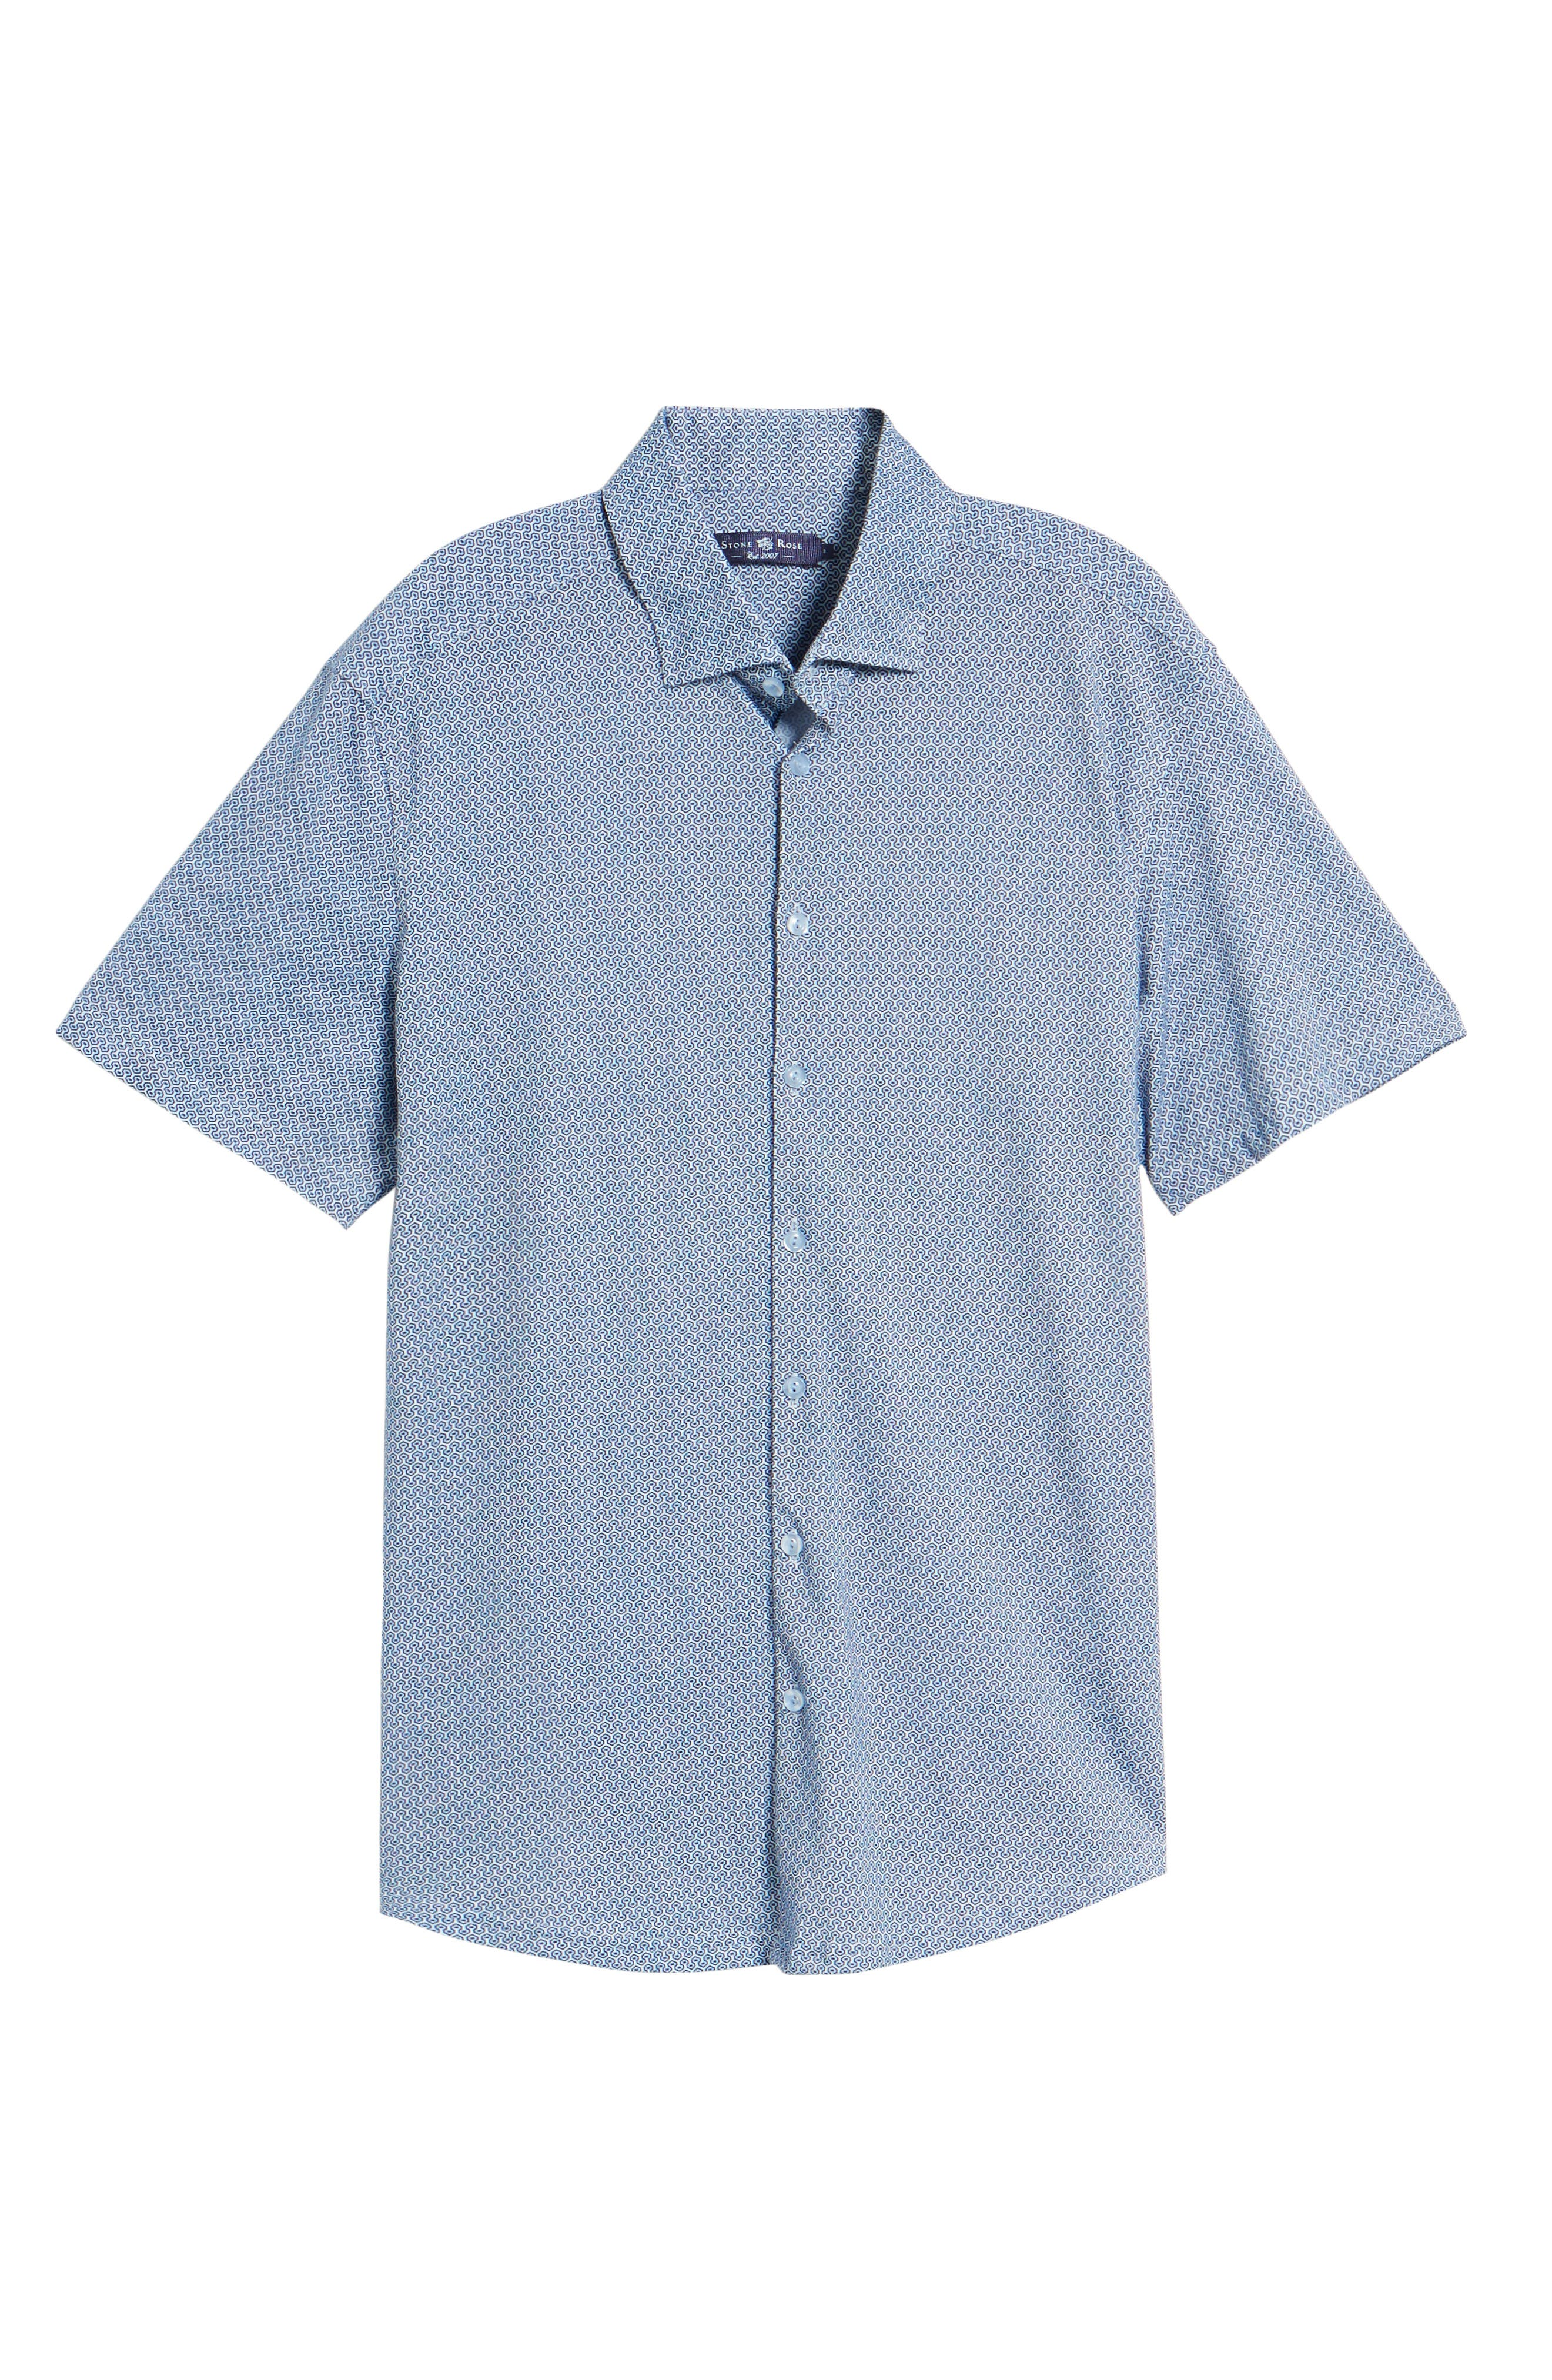 Knit Sport Shirt,                             Alternate thumbnail 6, color,                             400